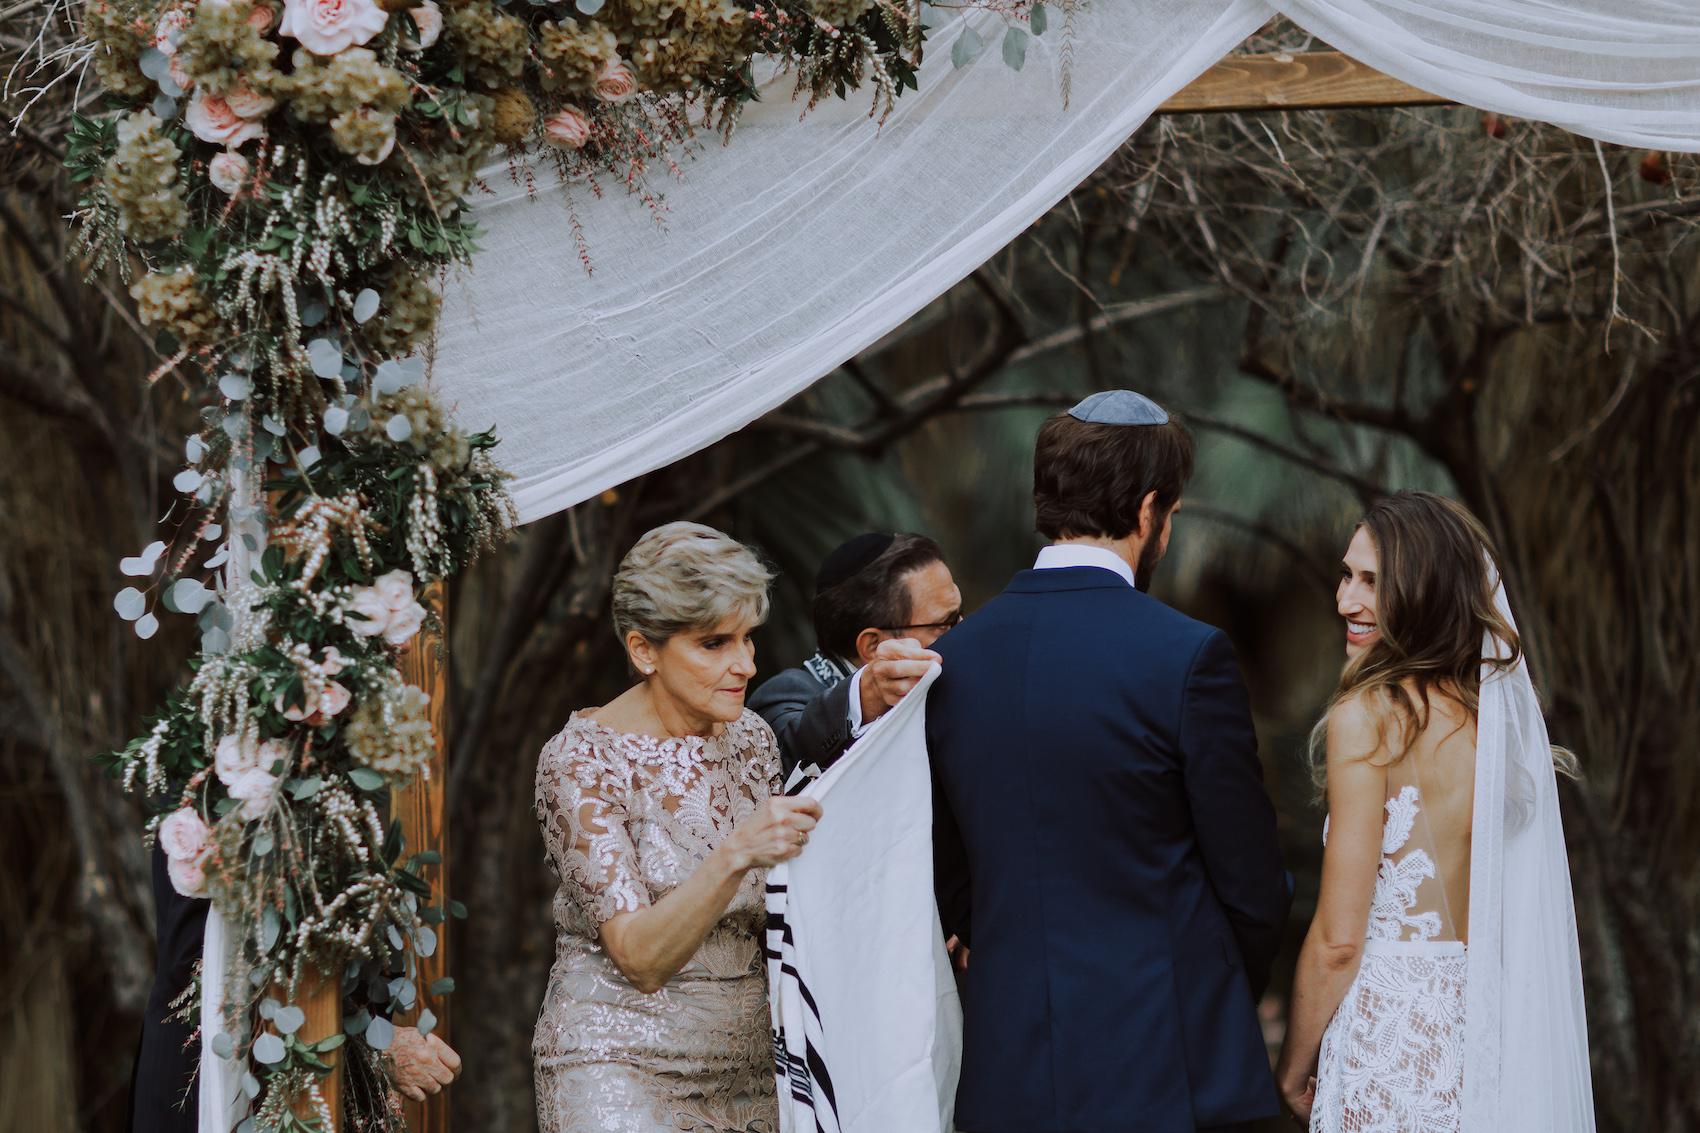 29-Palms-Inn-Joshua-Tree-Jewish-Wedding-H+M-46.jpg